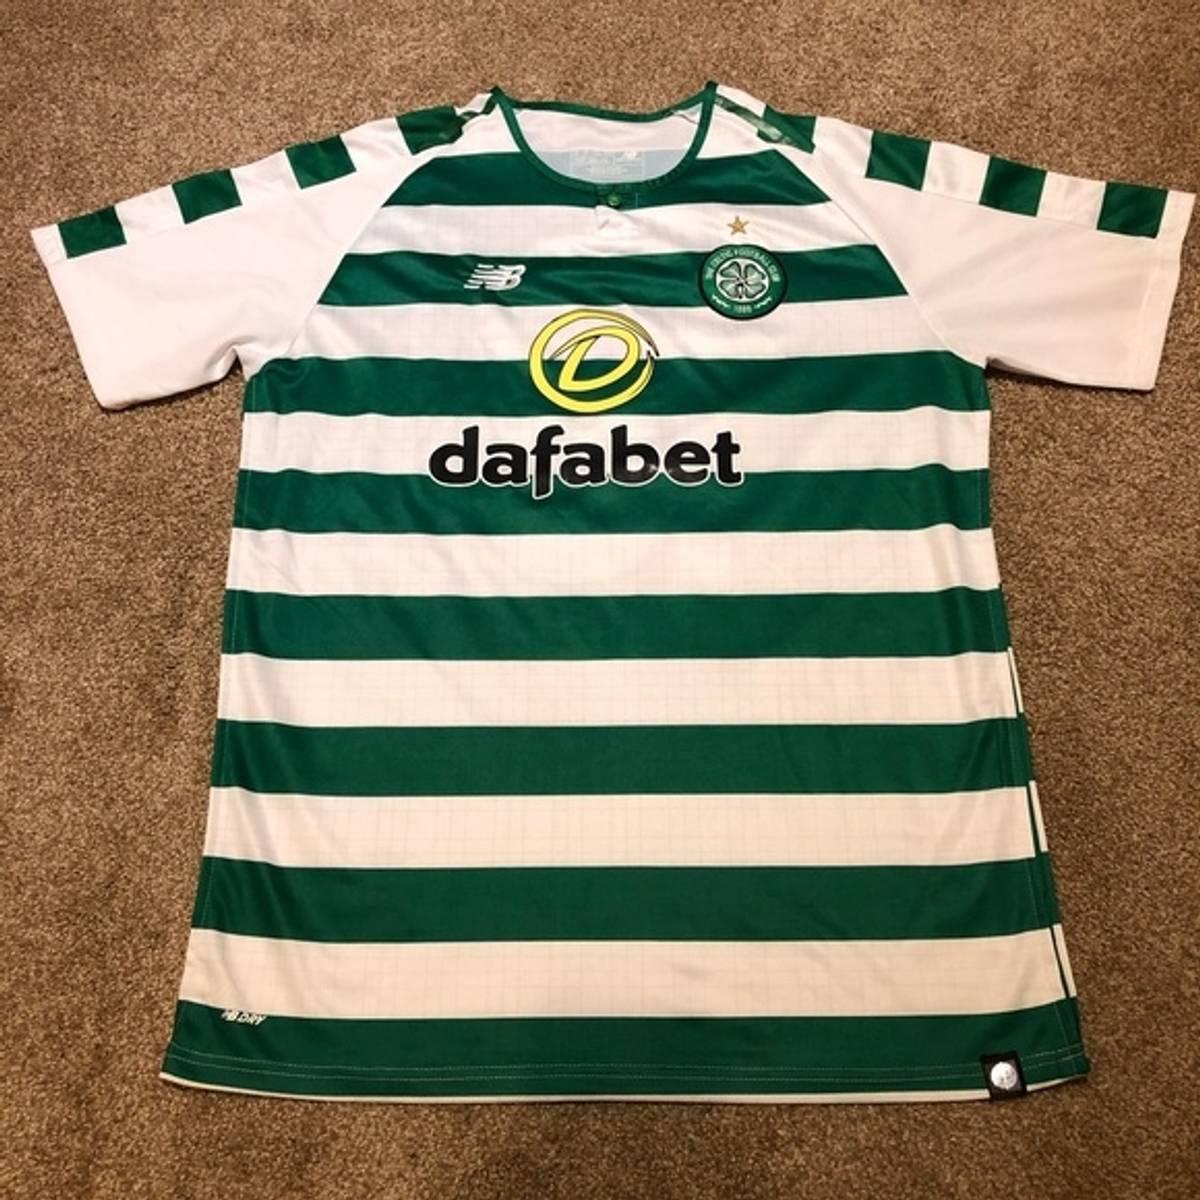 quality design 0077c ff0b9 New Balance Tom Rogic Celtic Fc Green/White New Balance Soccer Jersey Size  Xxl $60